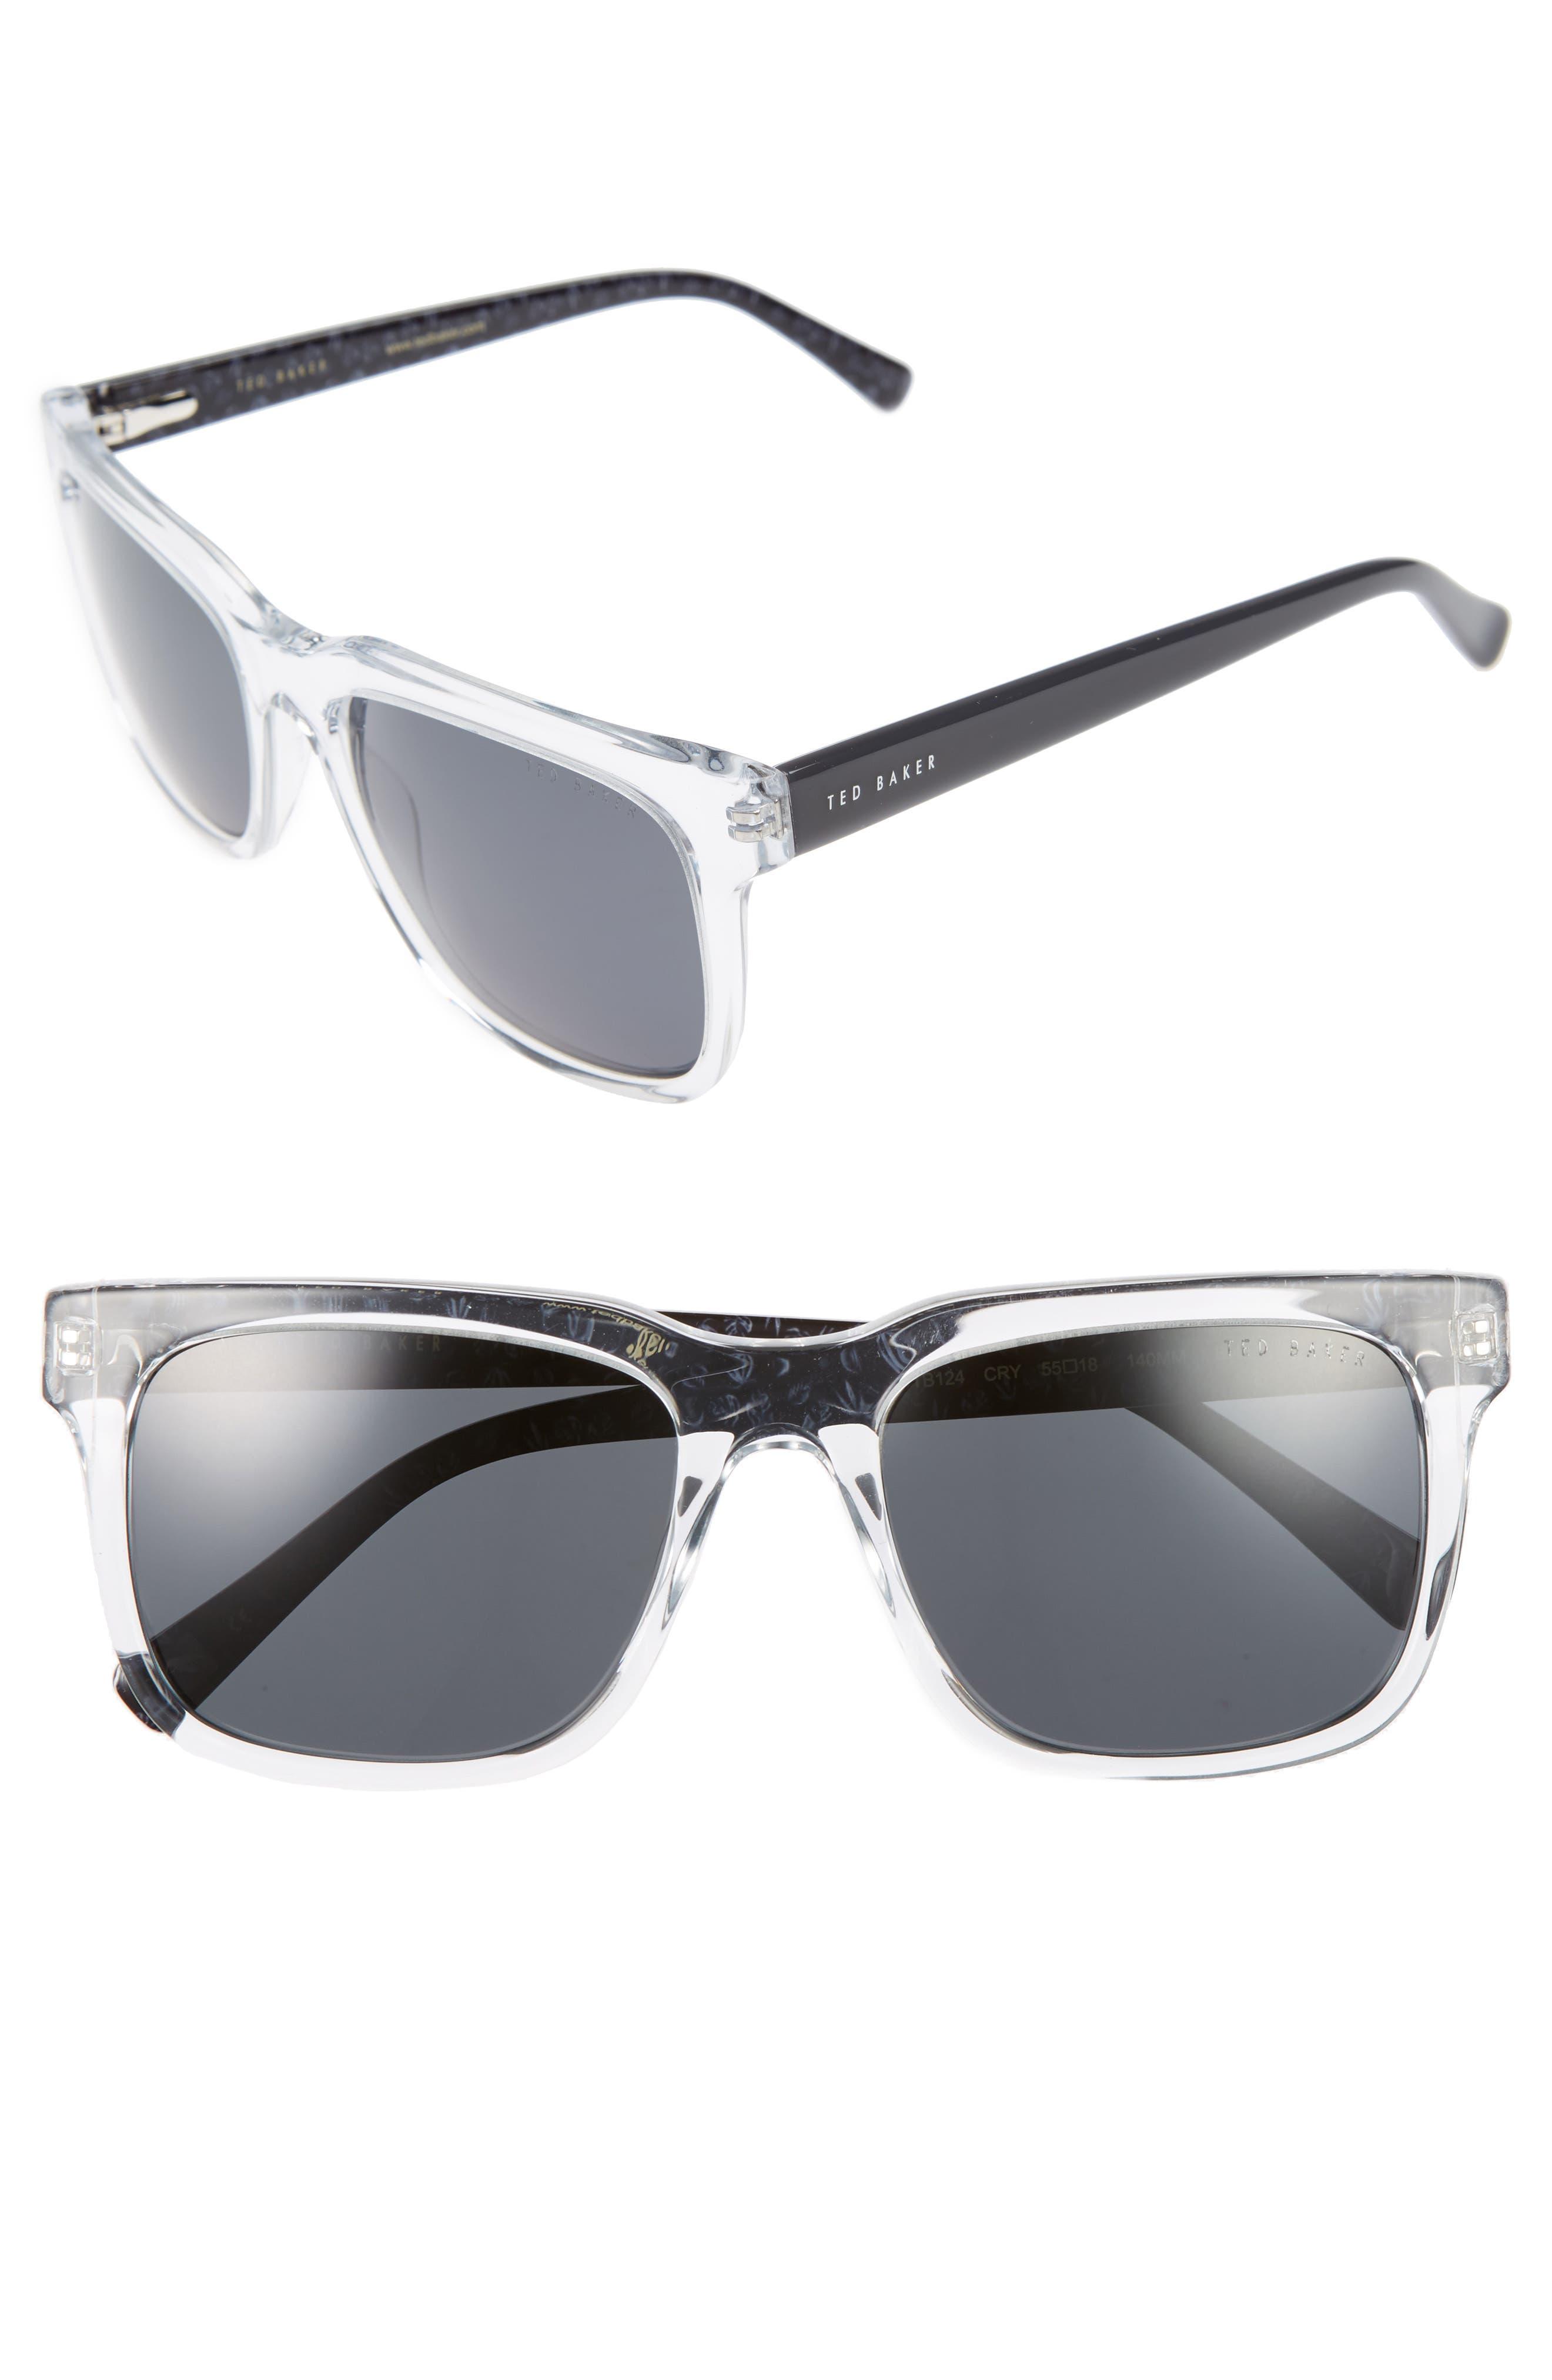 55mm Polarized Sunglasses,                             Main thumbnail 1, color,                             141